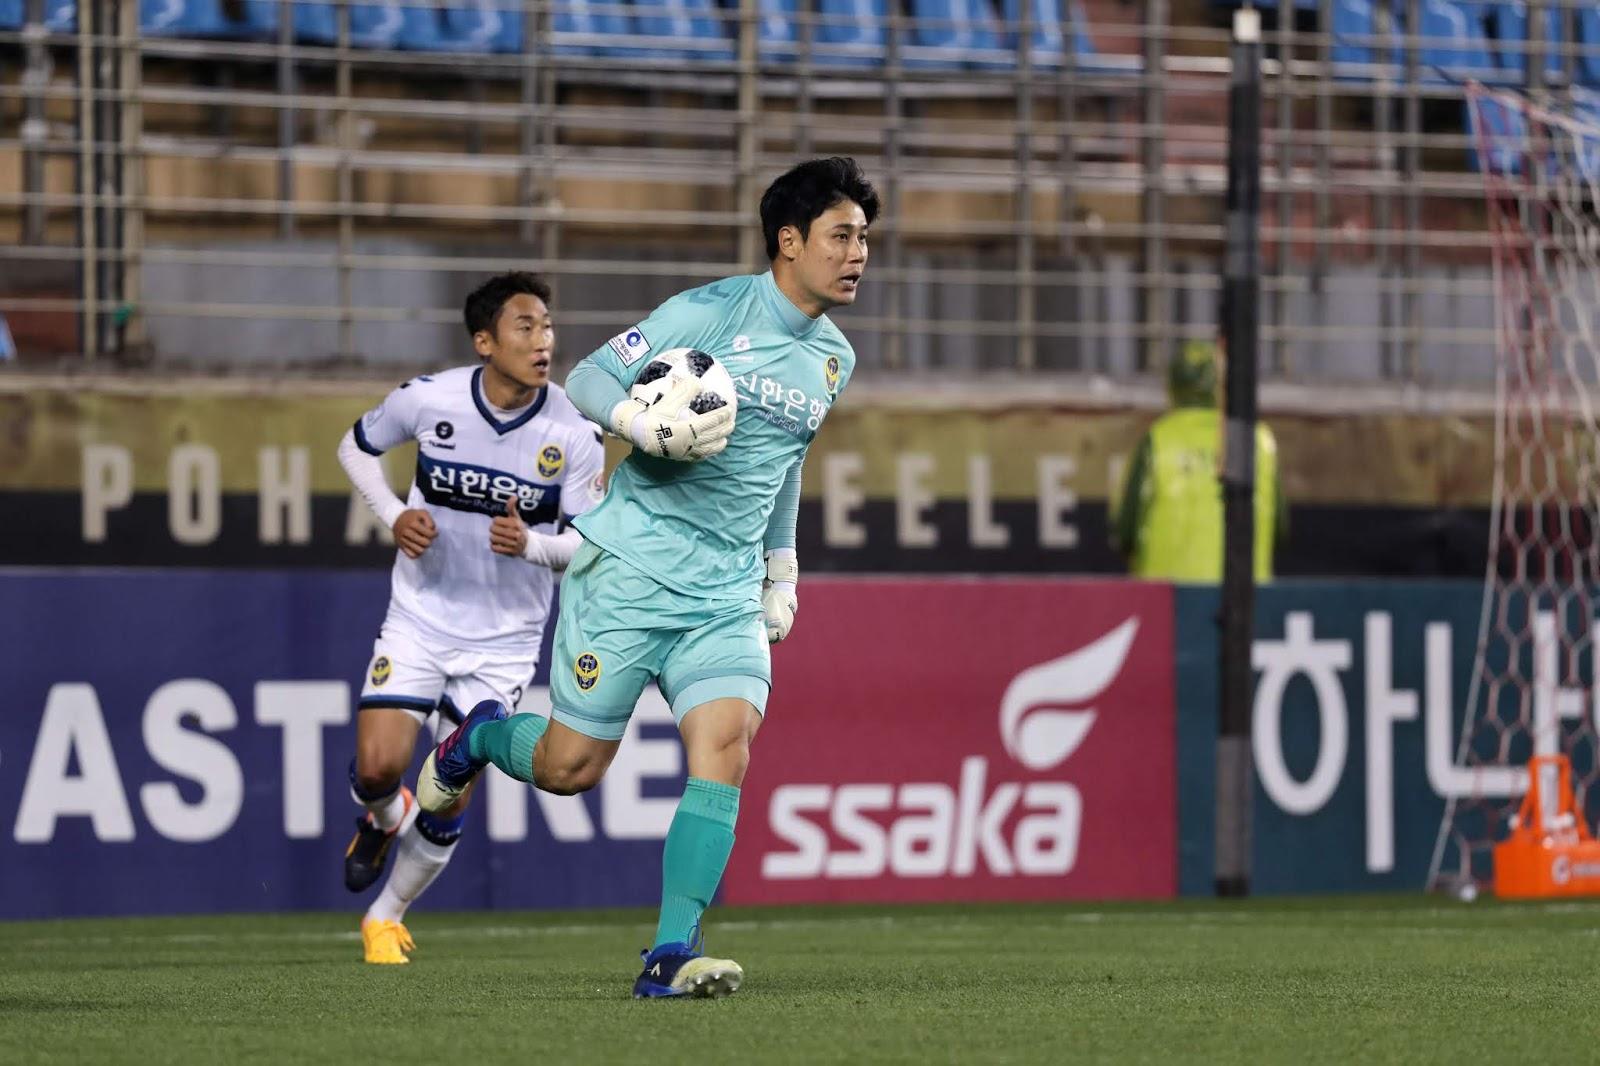 2018 Season Review: Incheon United Lee Jin-hyung